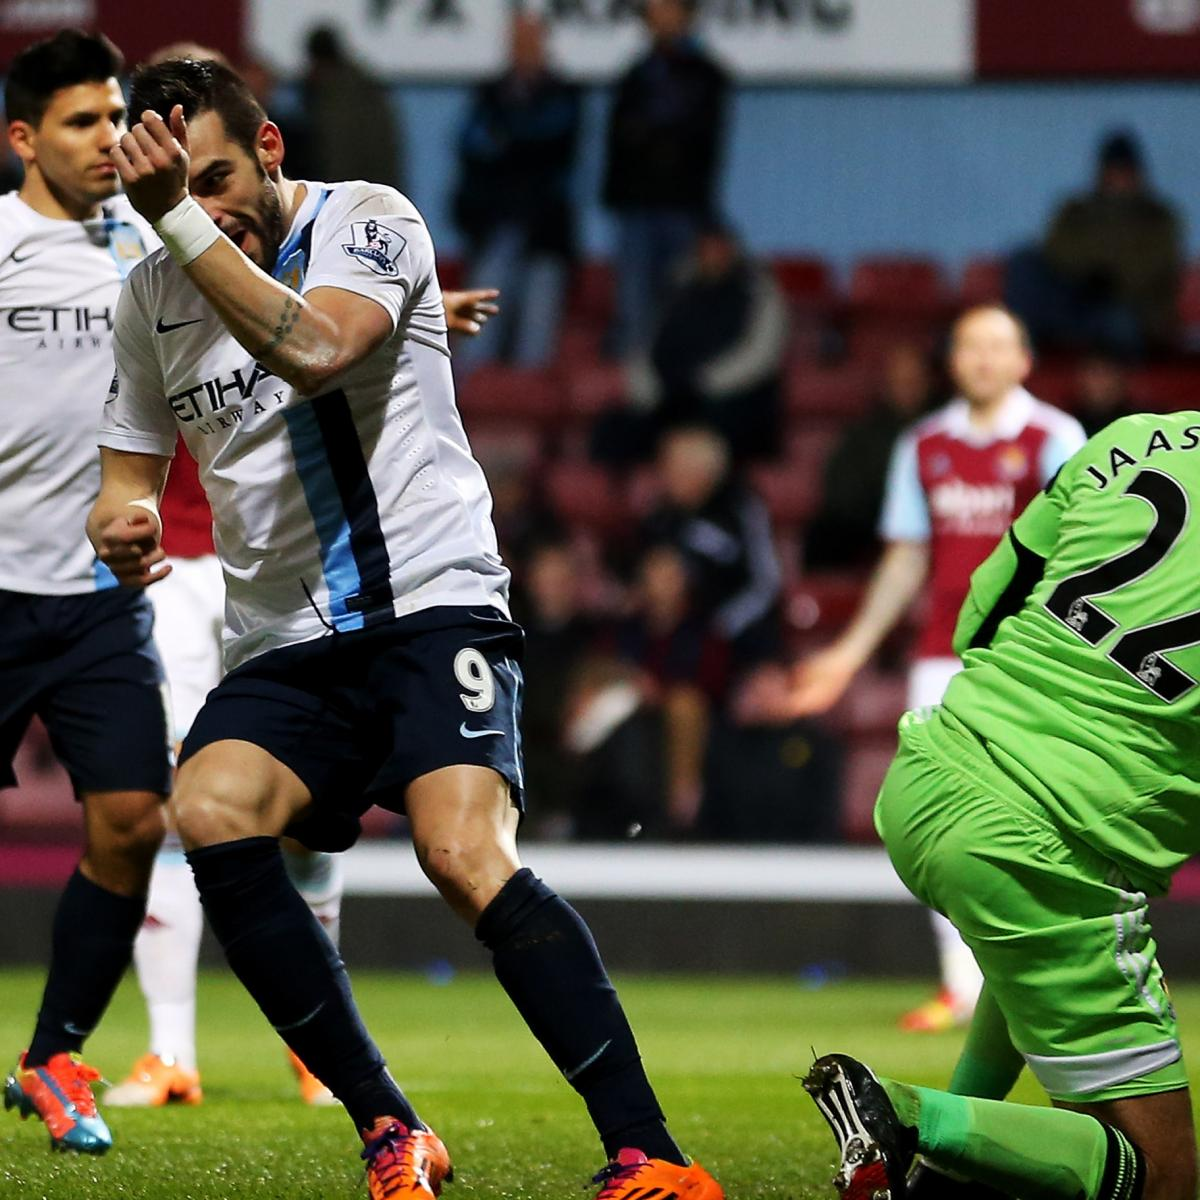 West Ham Vs. Manchester City: Capital One Cup Live Score